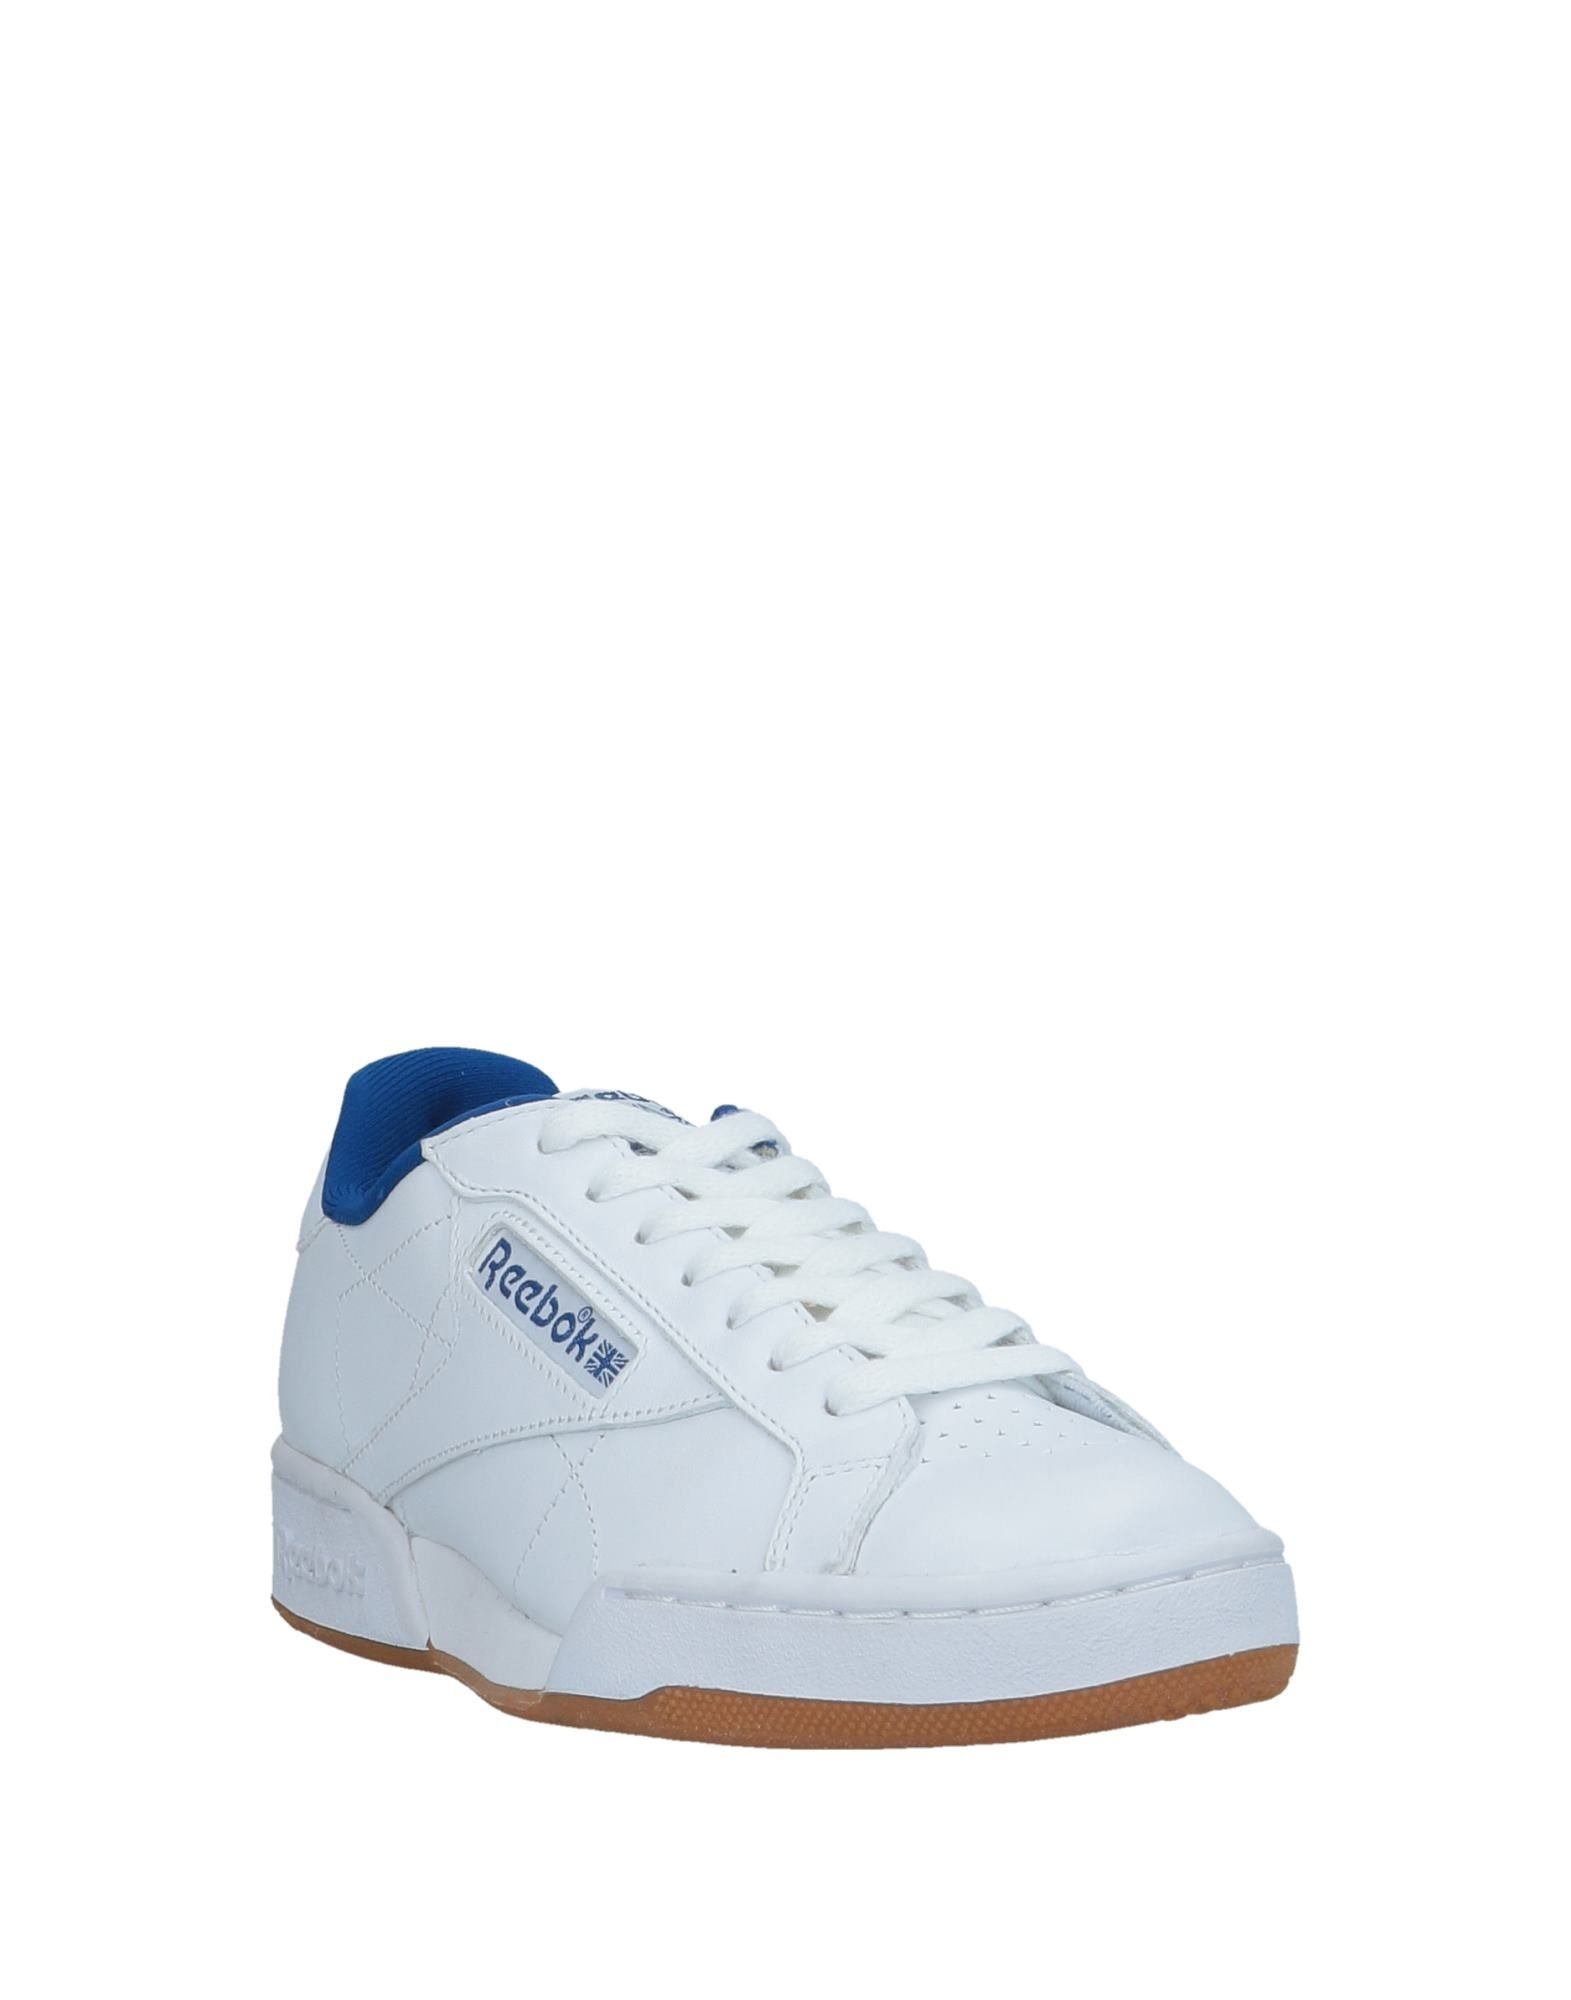 Reebok Sneakers Gute Damen  11535298WR Gute Sneakers Qualität beliebte Schuhe 5265b6